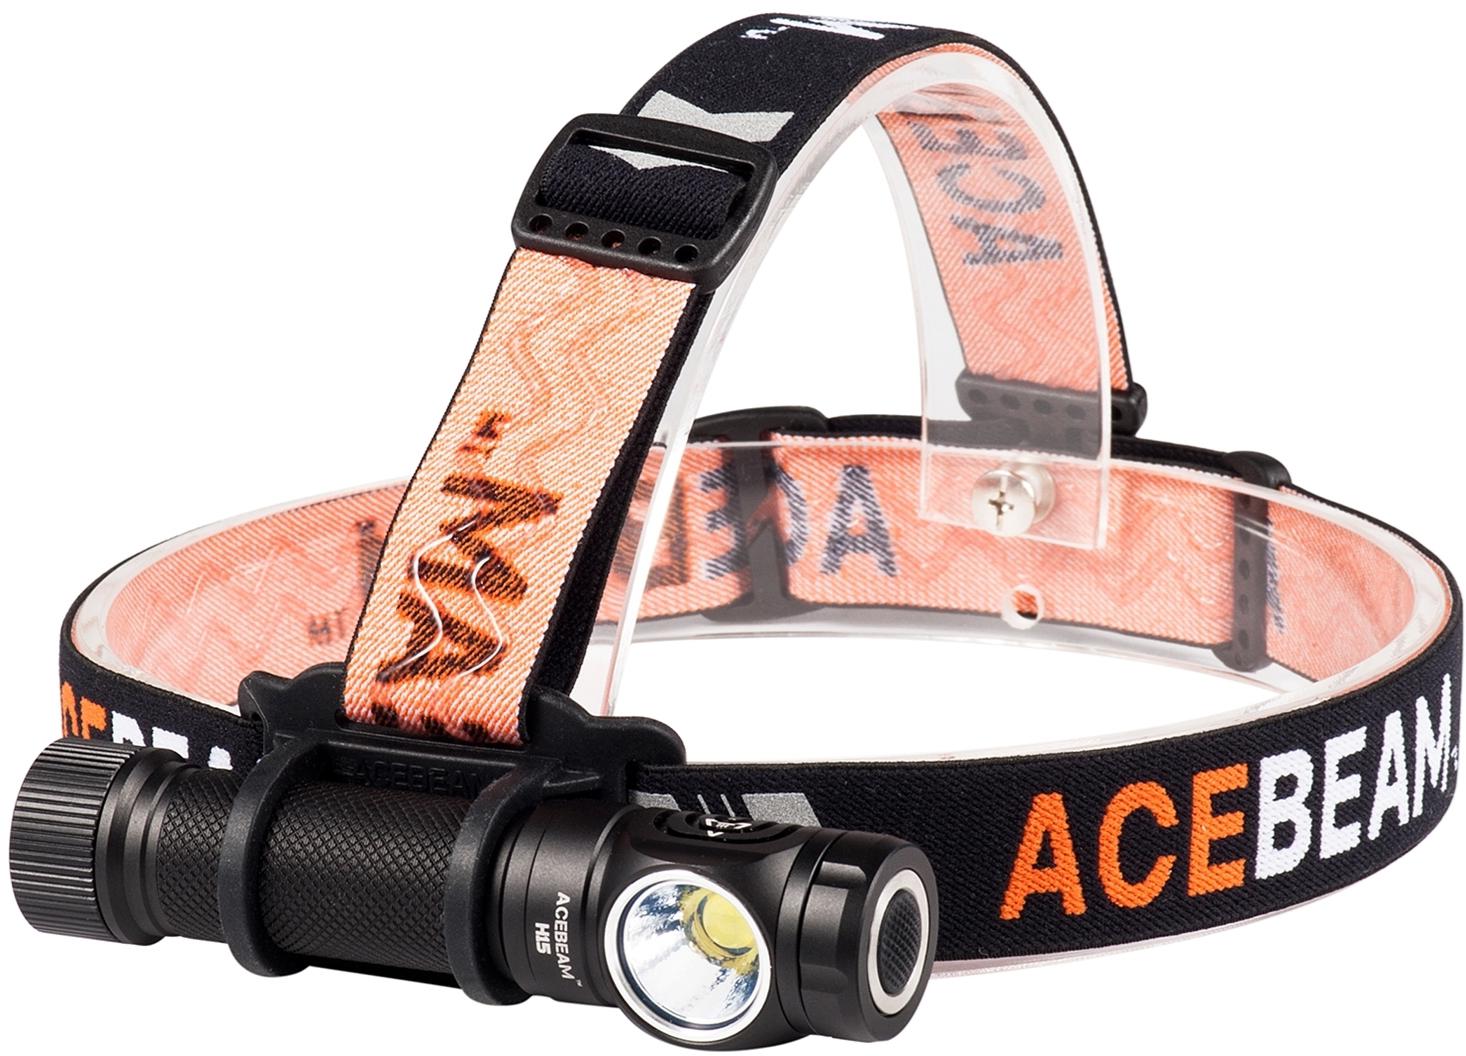 AceBeam H15 LED Headlamp, Black, 2500 Max Lumens